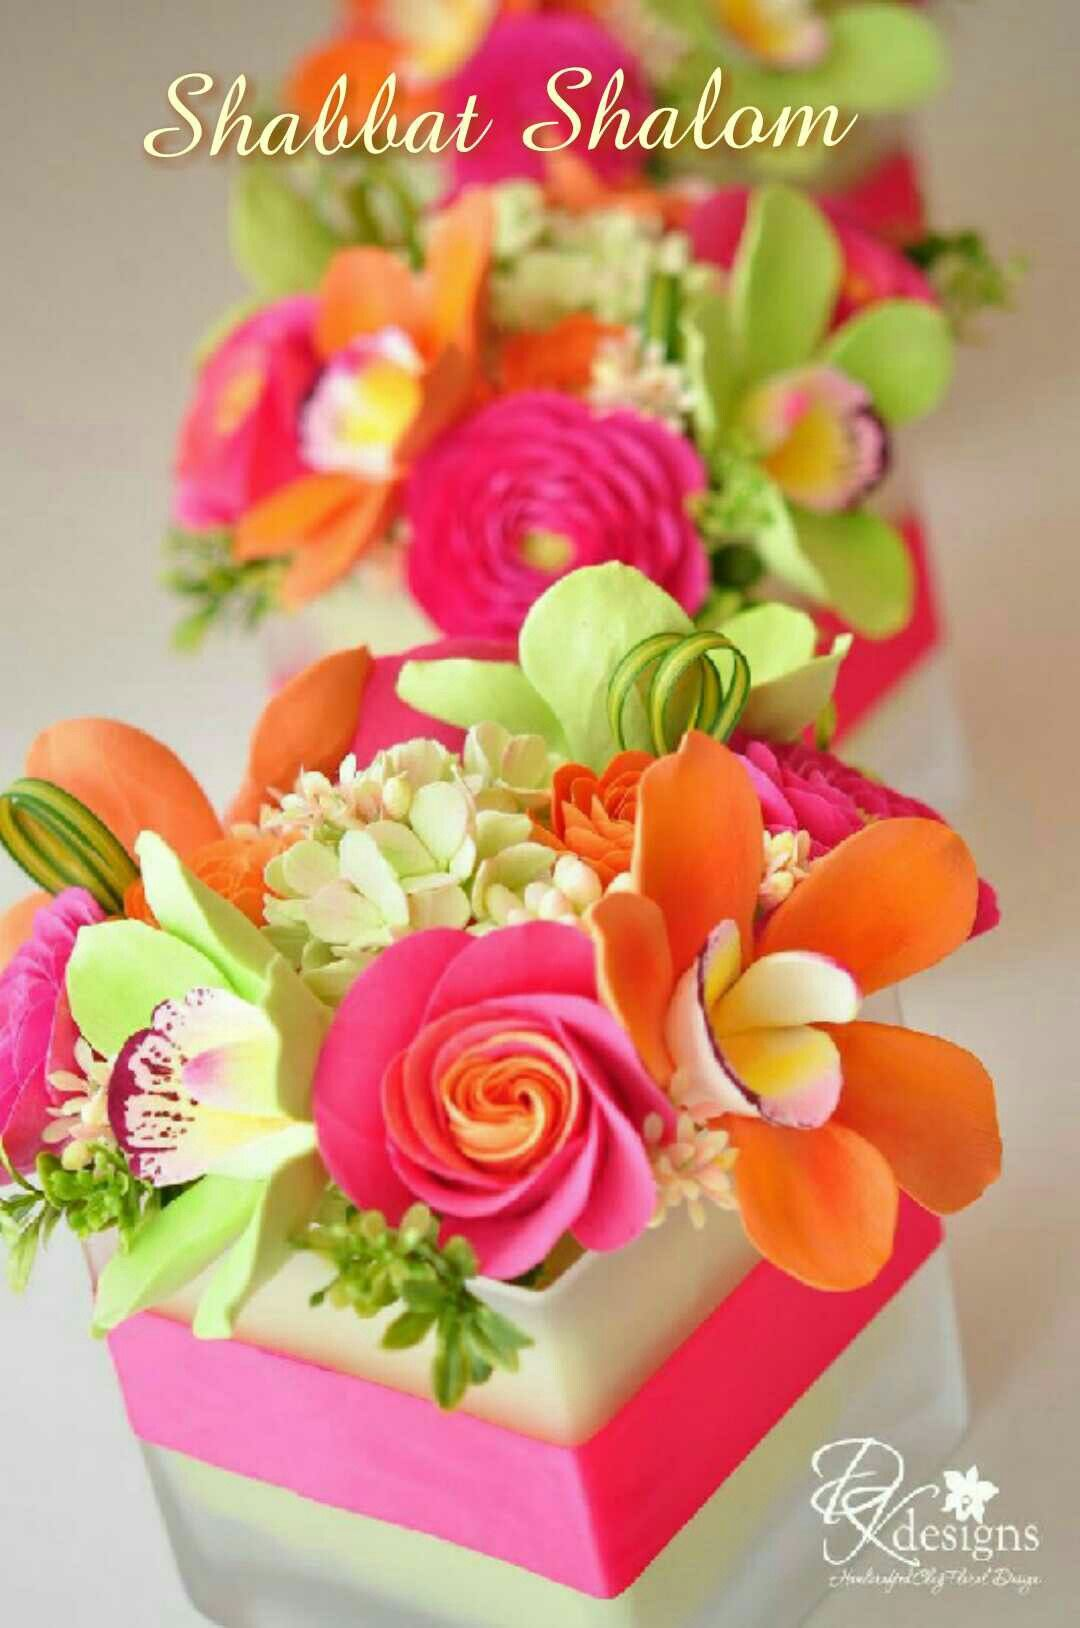 Shabbat shalom shabbat shalom pinterest for What colour roses can you get